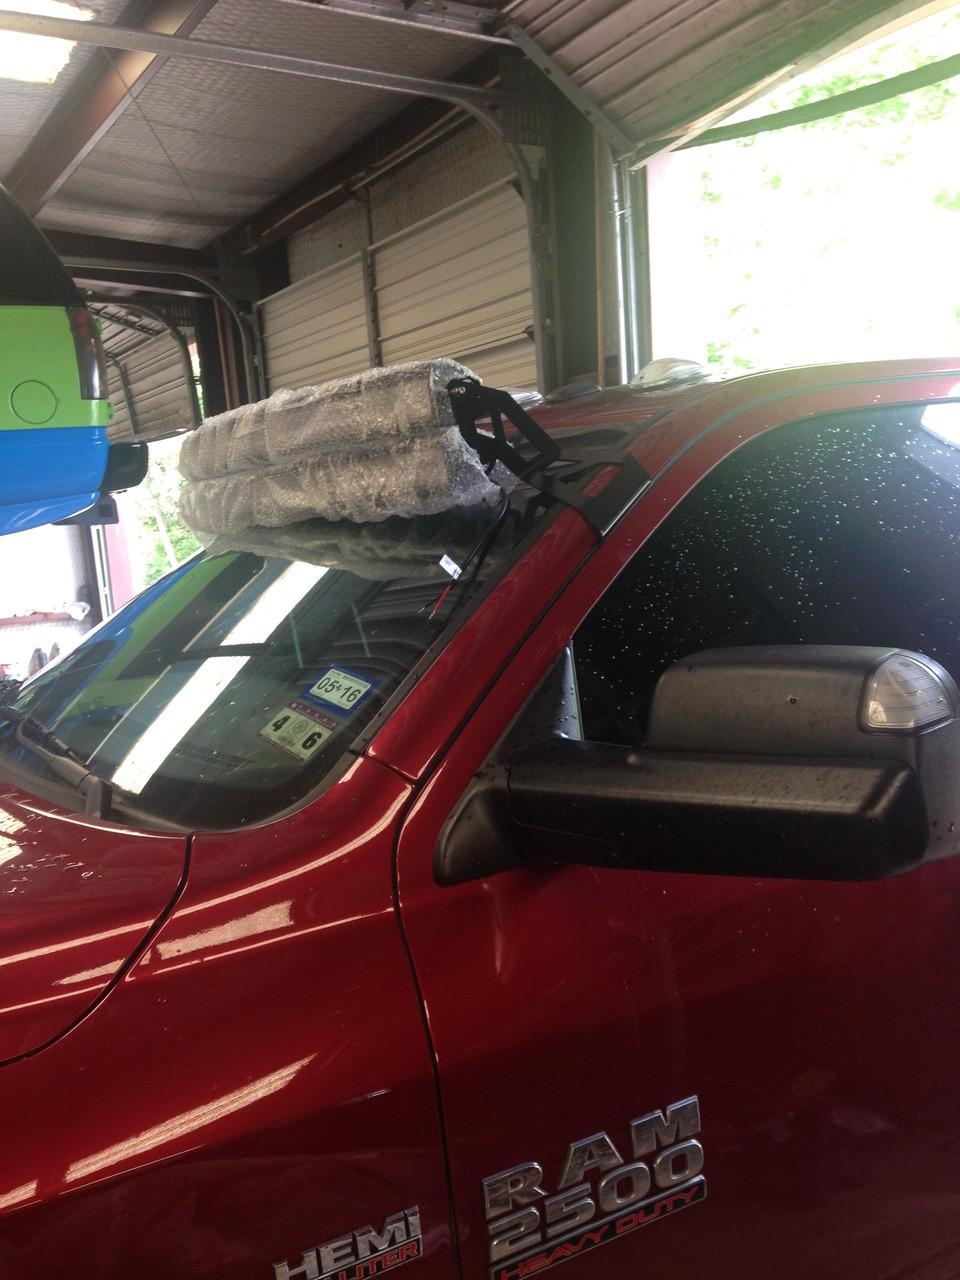 2009 2015 dodge ram 25003500 black windshield led light bar mounts 2009 2015 dodge ram 25003500 black windshield led light bar mounts double bars proramlbm dbl aloadofball Choice Image